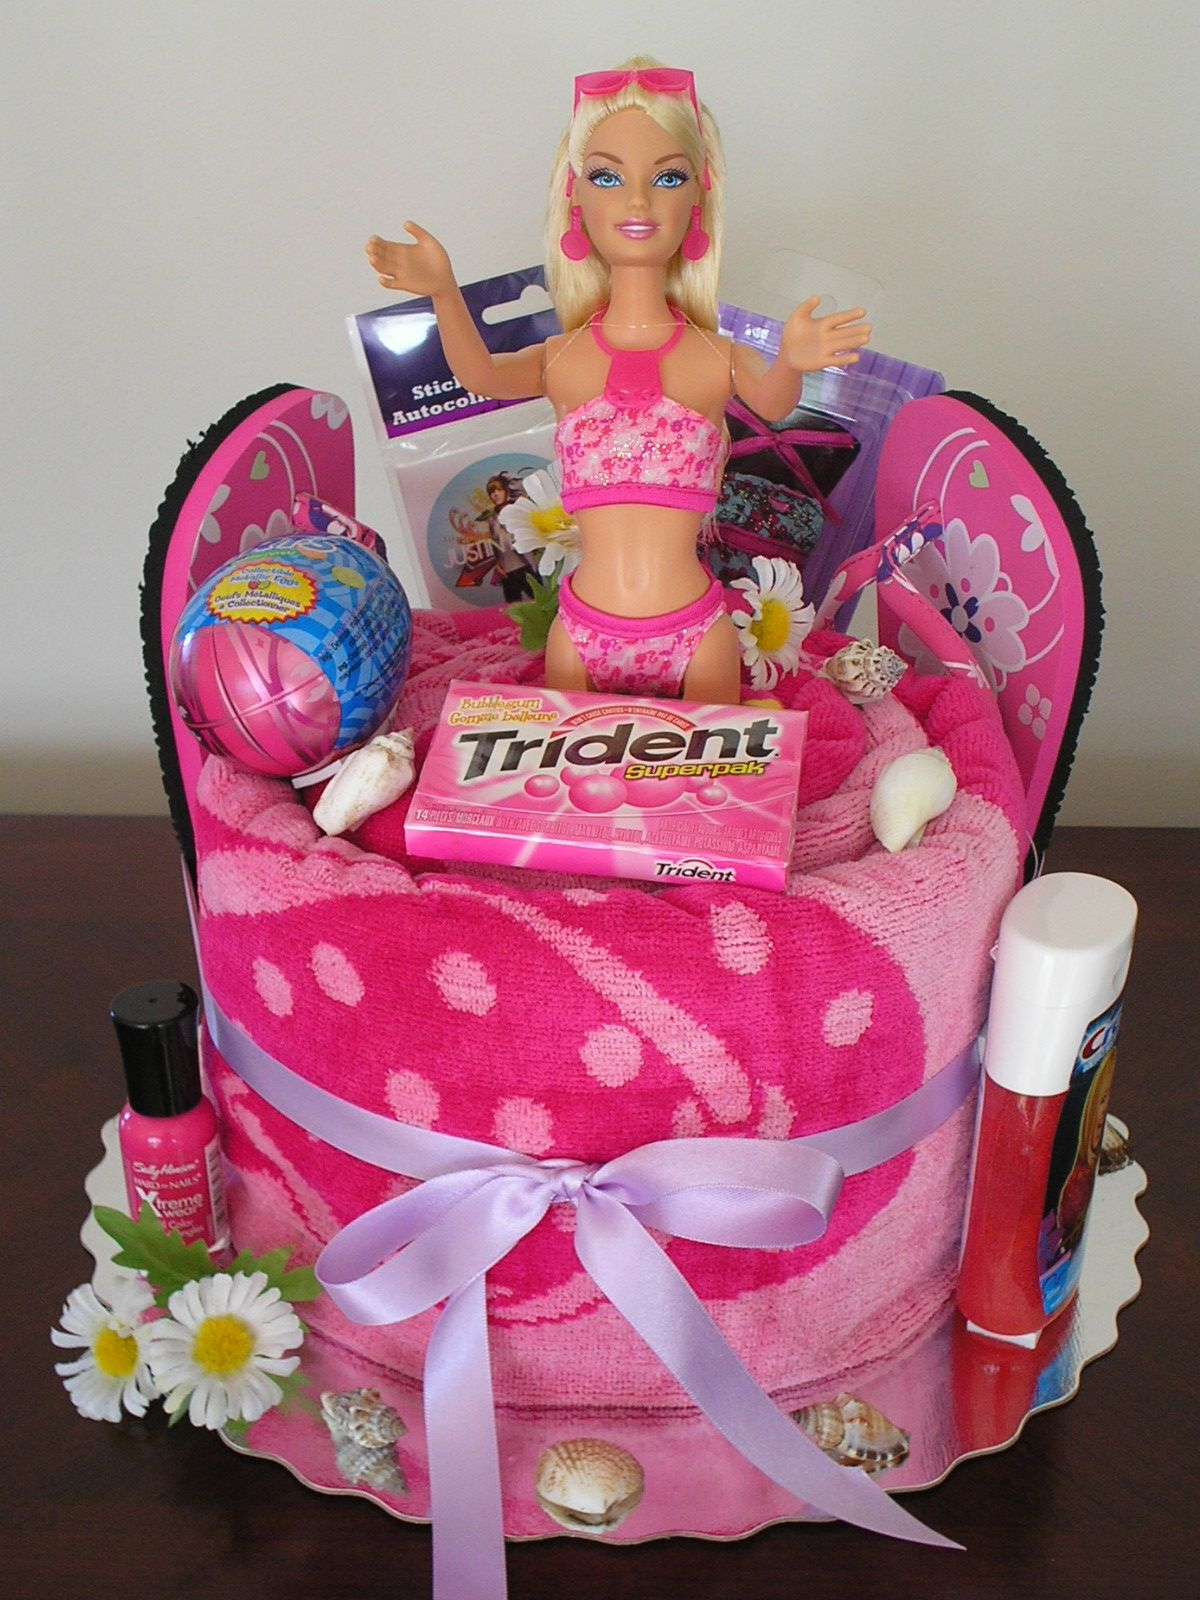 Happy Birthday Barbie Towel Cake Creative T Idea This